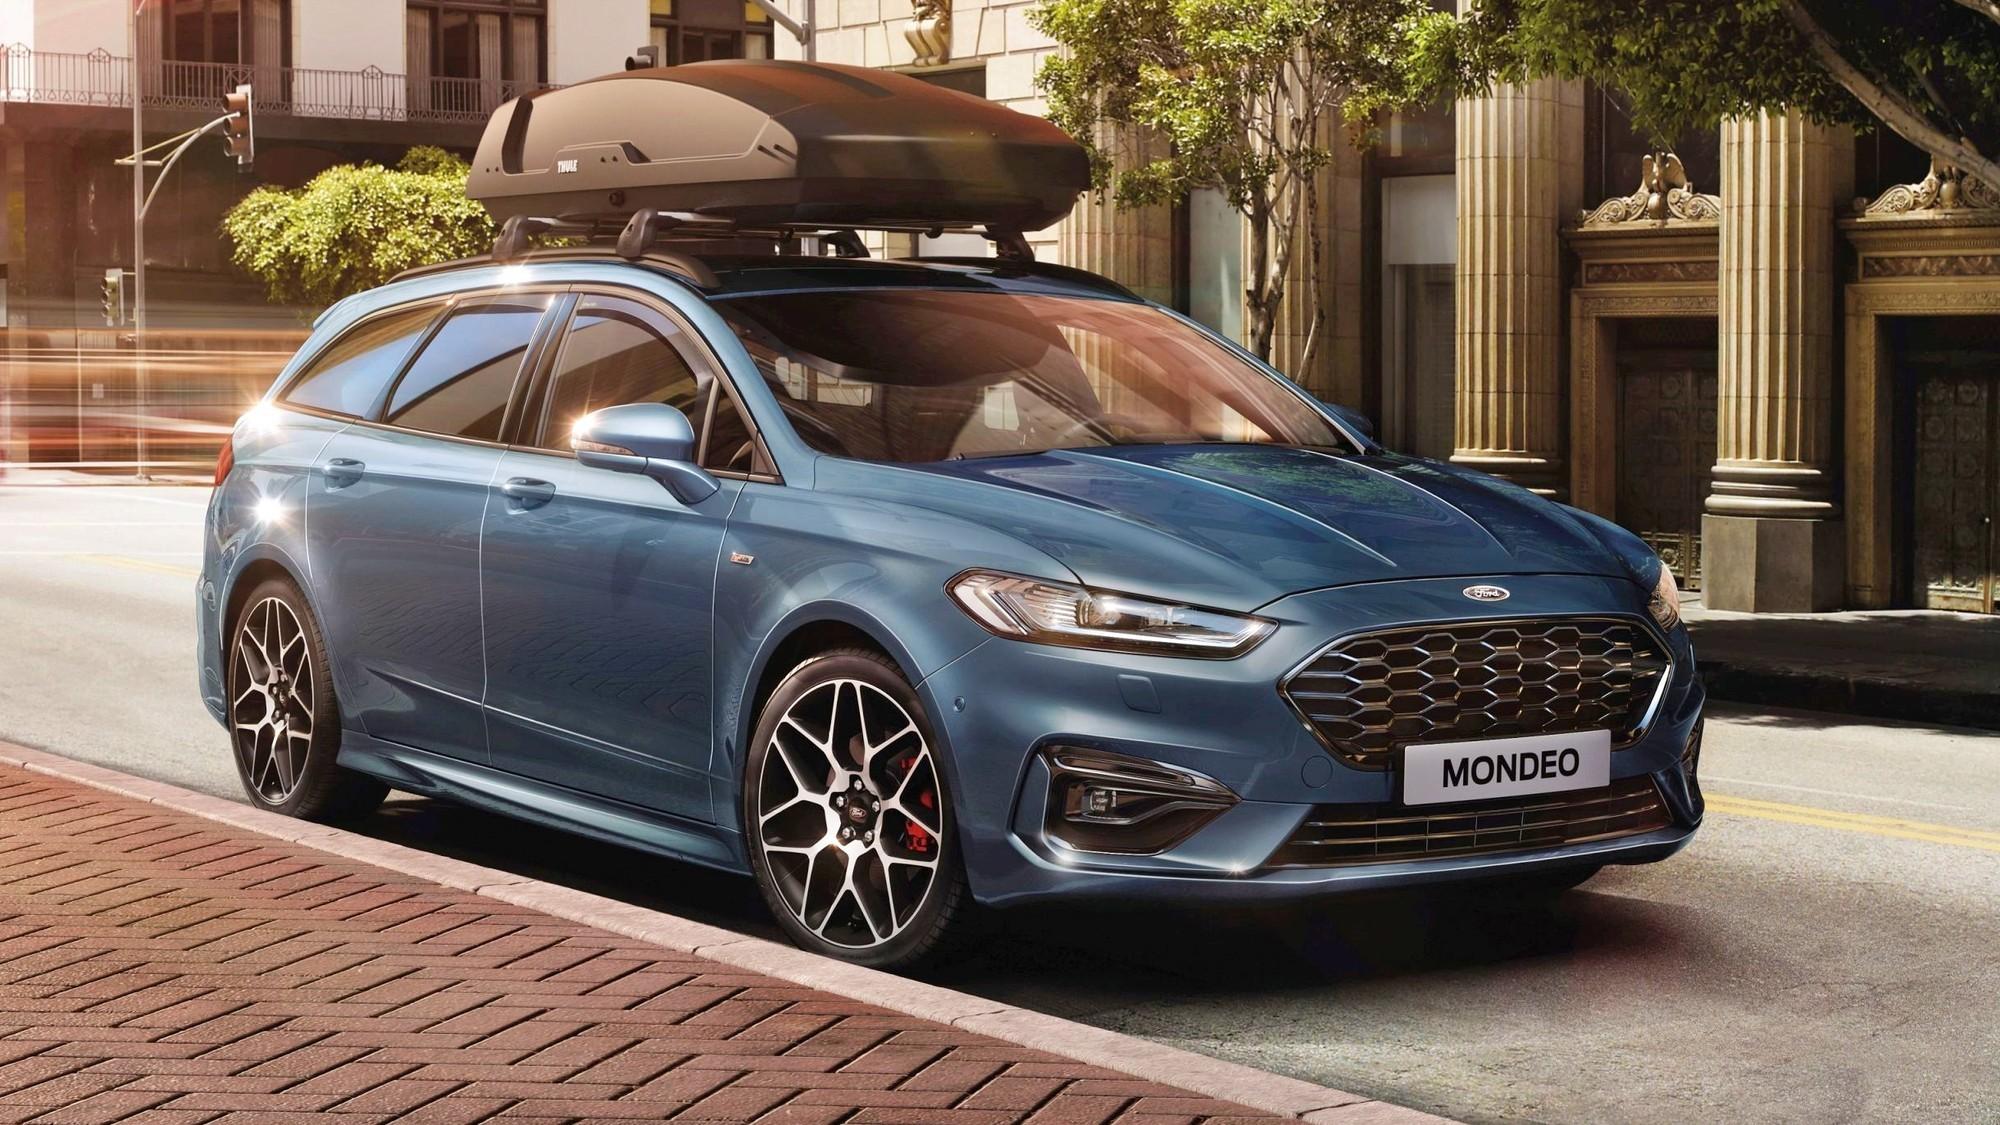 Ford объявил о скором завершении производства Mondeo в Европе